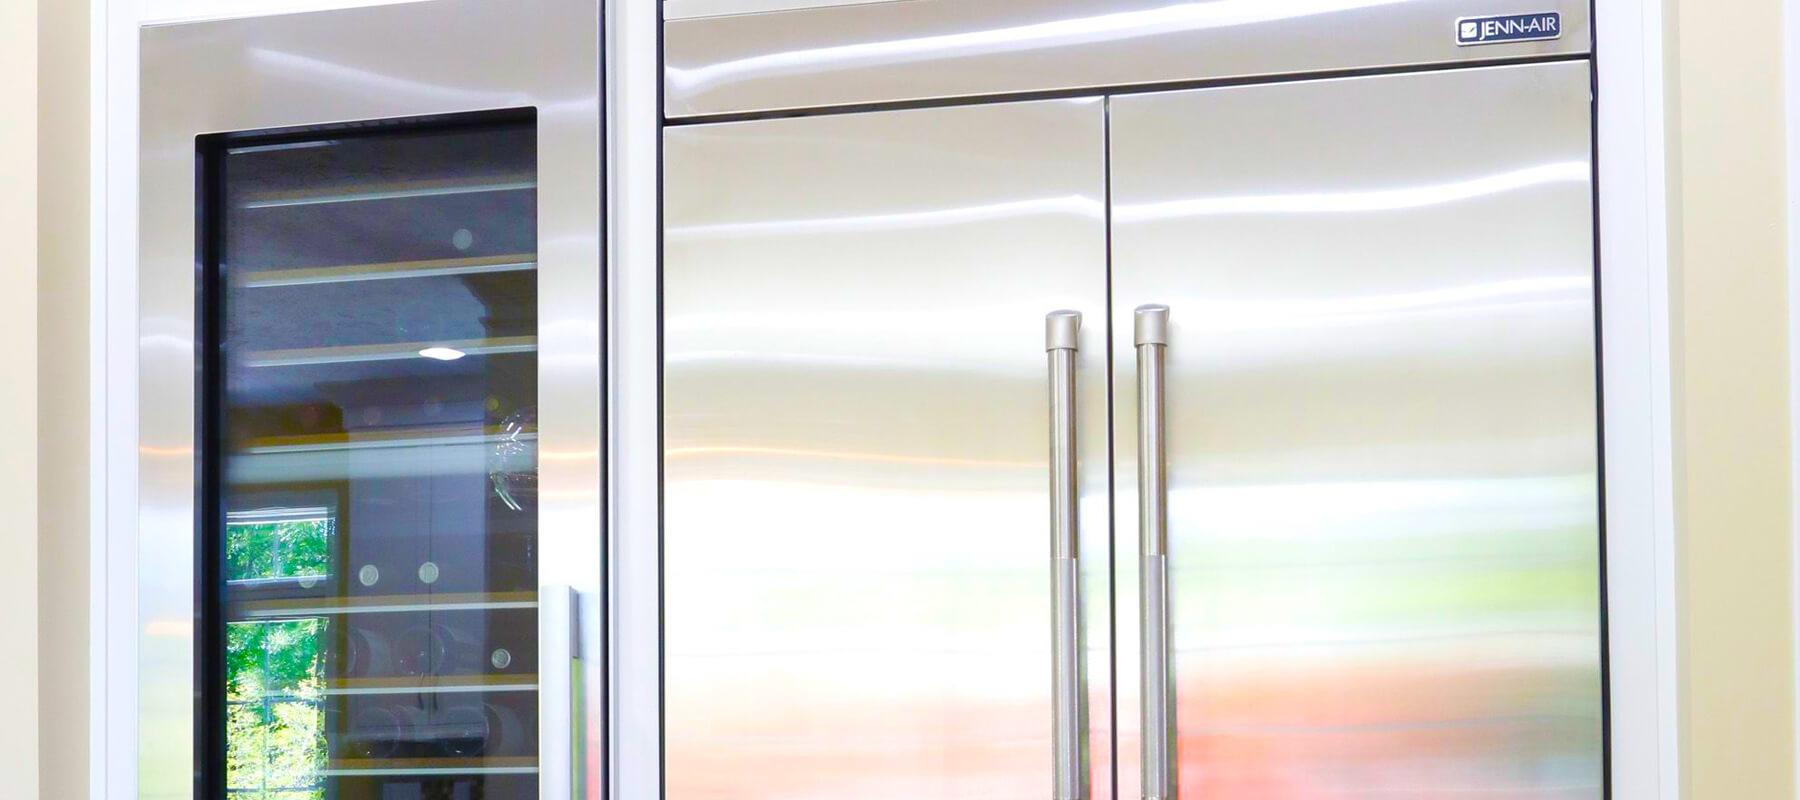 Built in Wine Refrigerator Undercounter Altadena | Built-in Refrigerator Repair